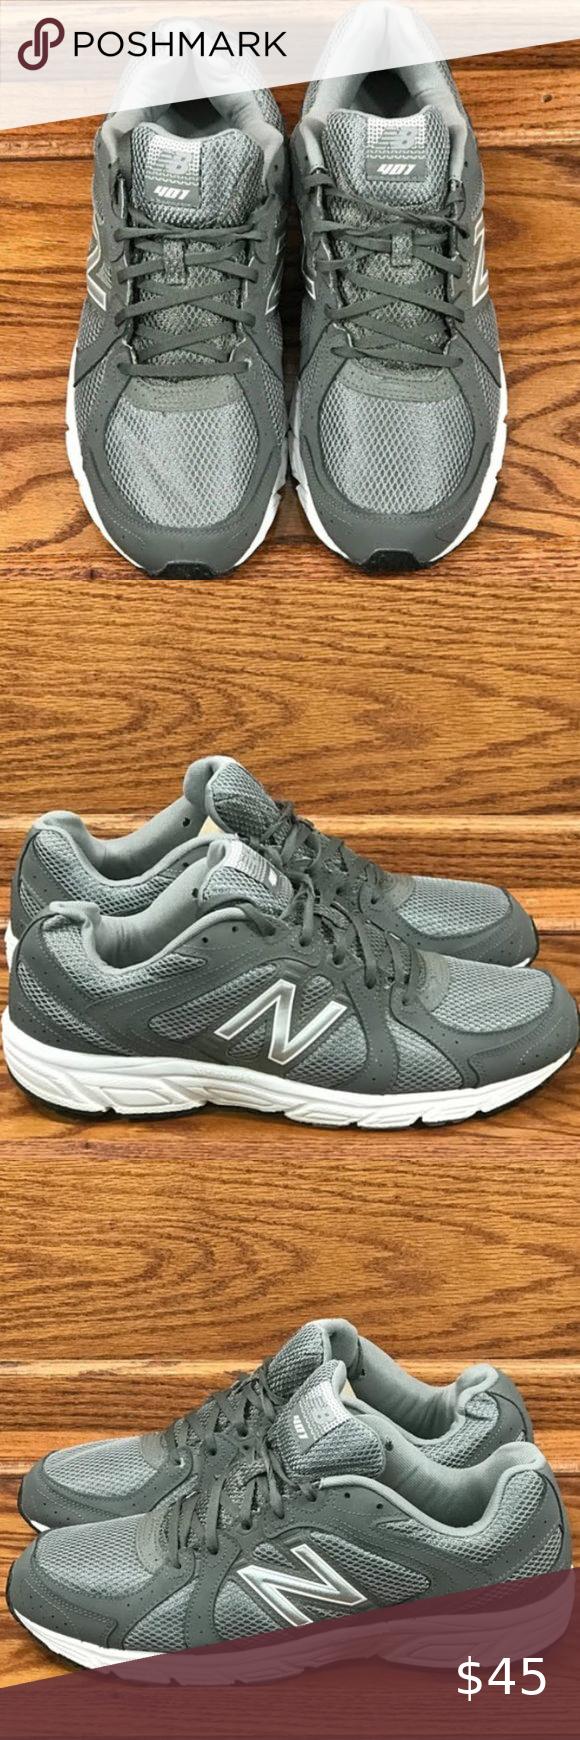 obra maestra Reorganizar Síguenos  New Balance 401 Sneakers | Sneakers, Womens shoes sneakers, New balance  shoes